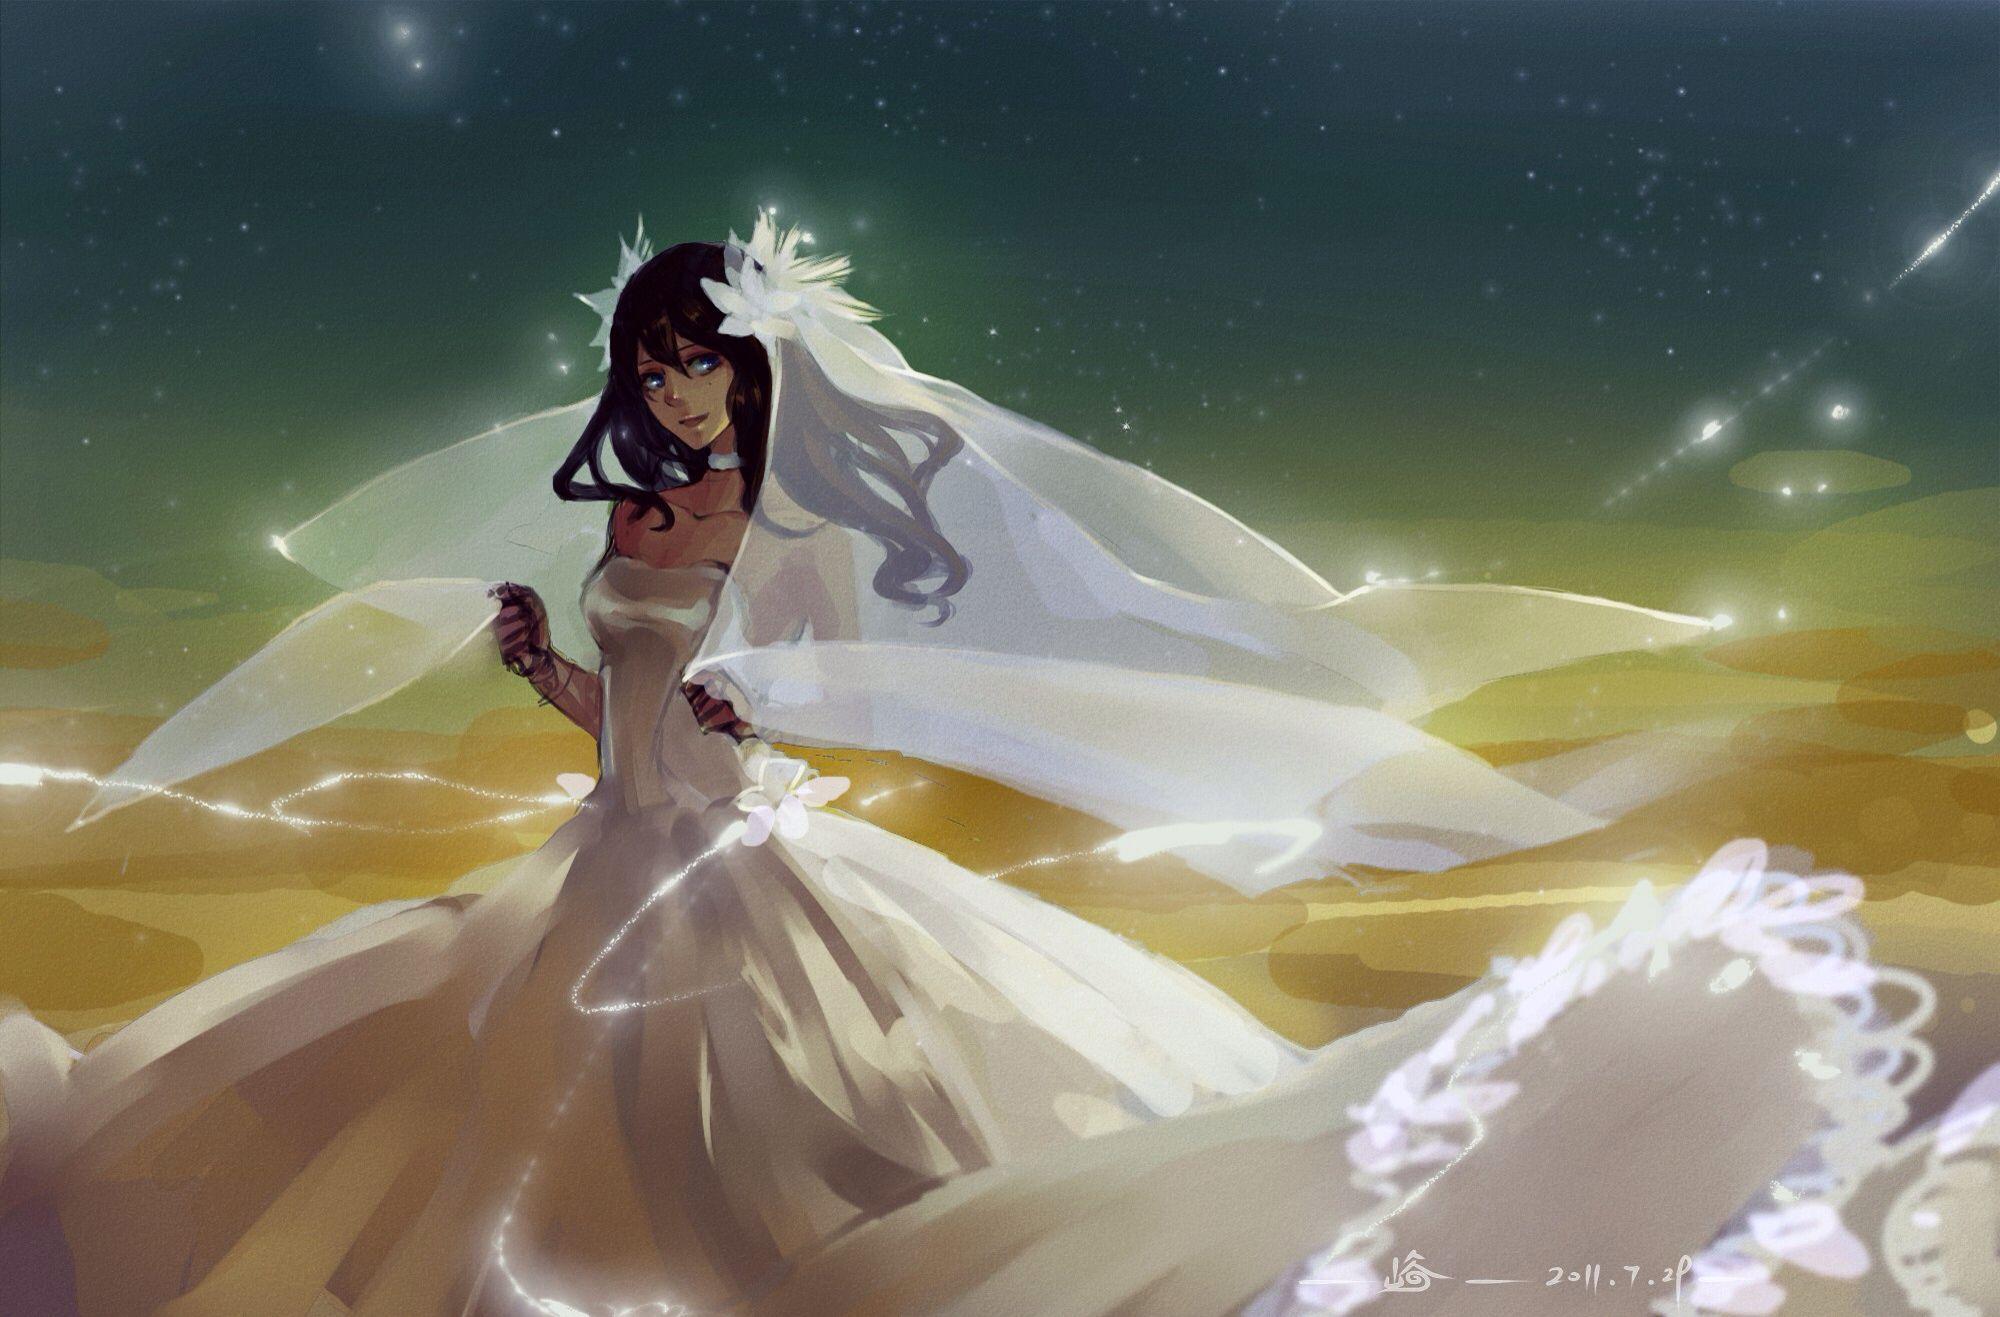 Sorta like a wedding dress anime girl